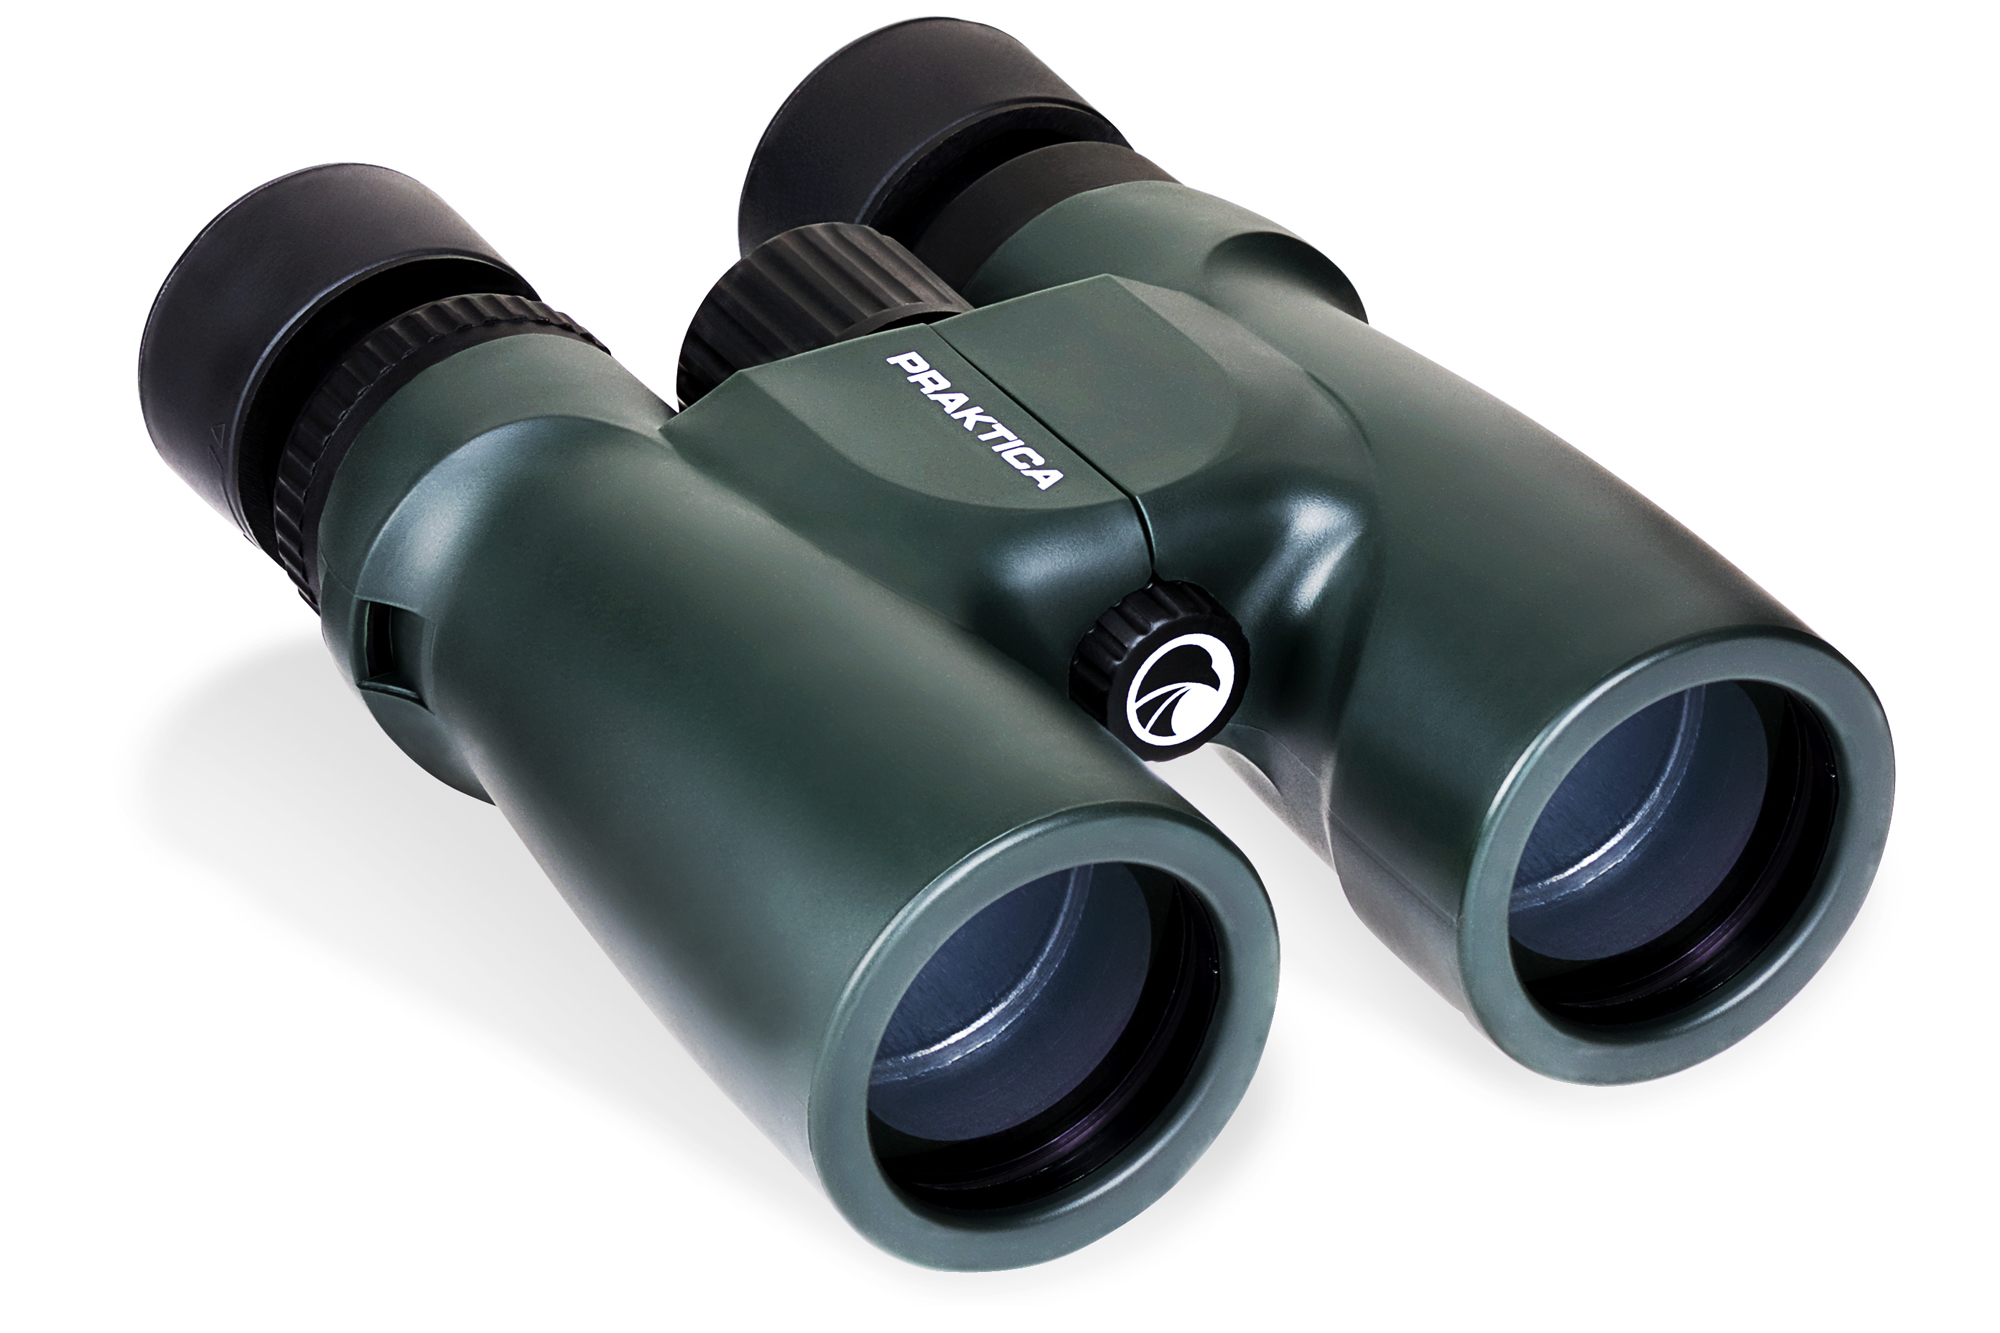 Praktica 10x42mm waterproof binoculars green cder1042g £69.34 london